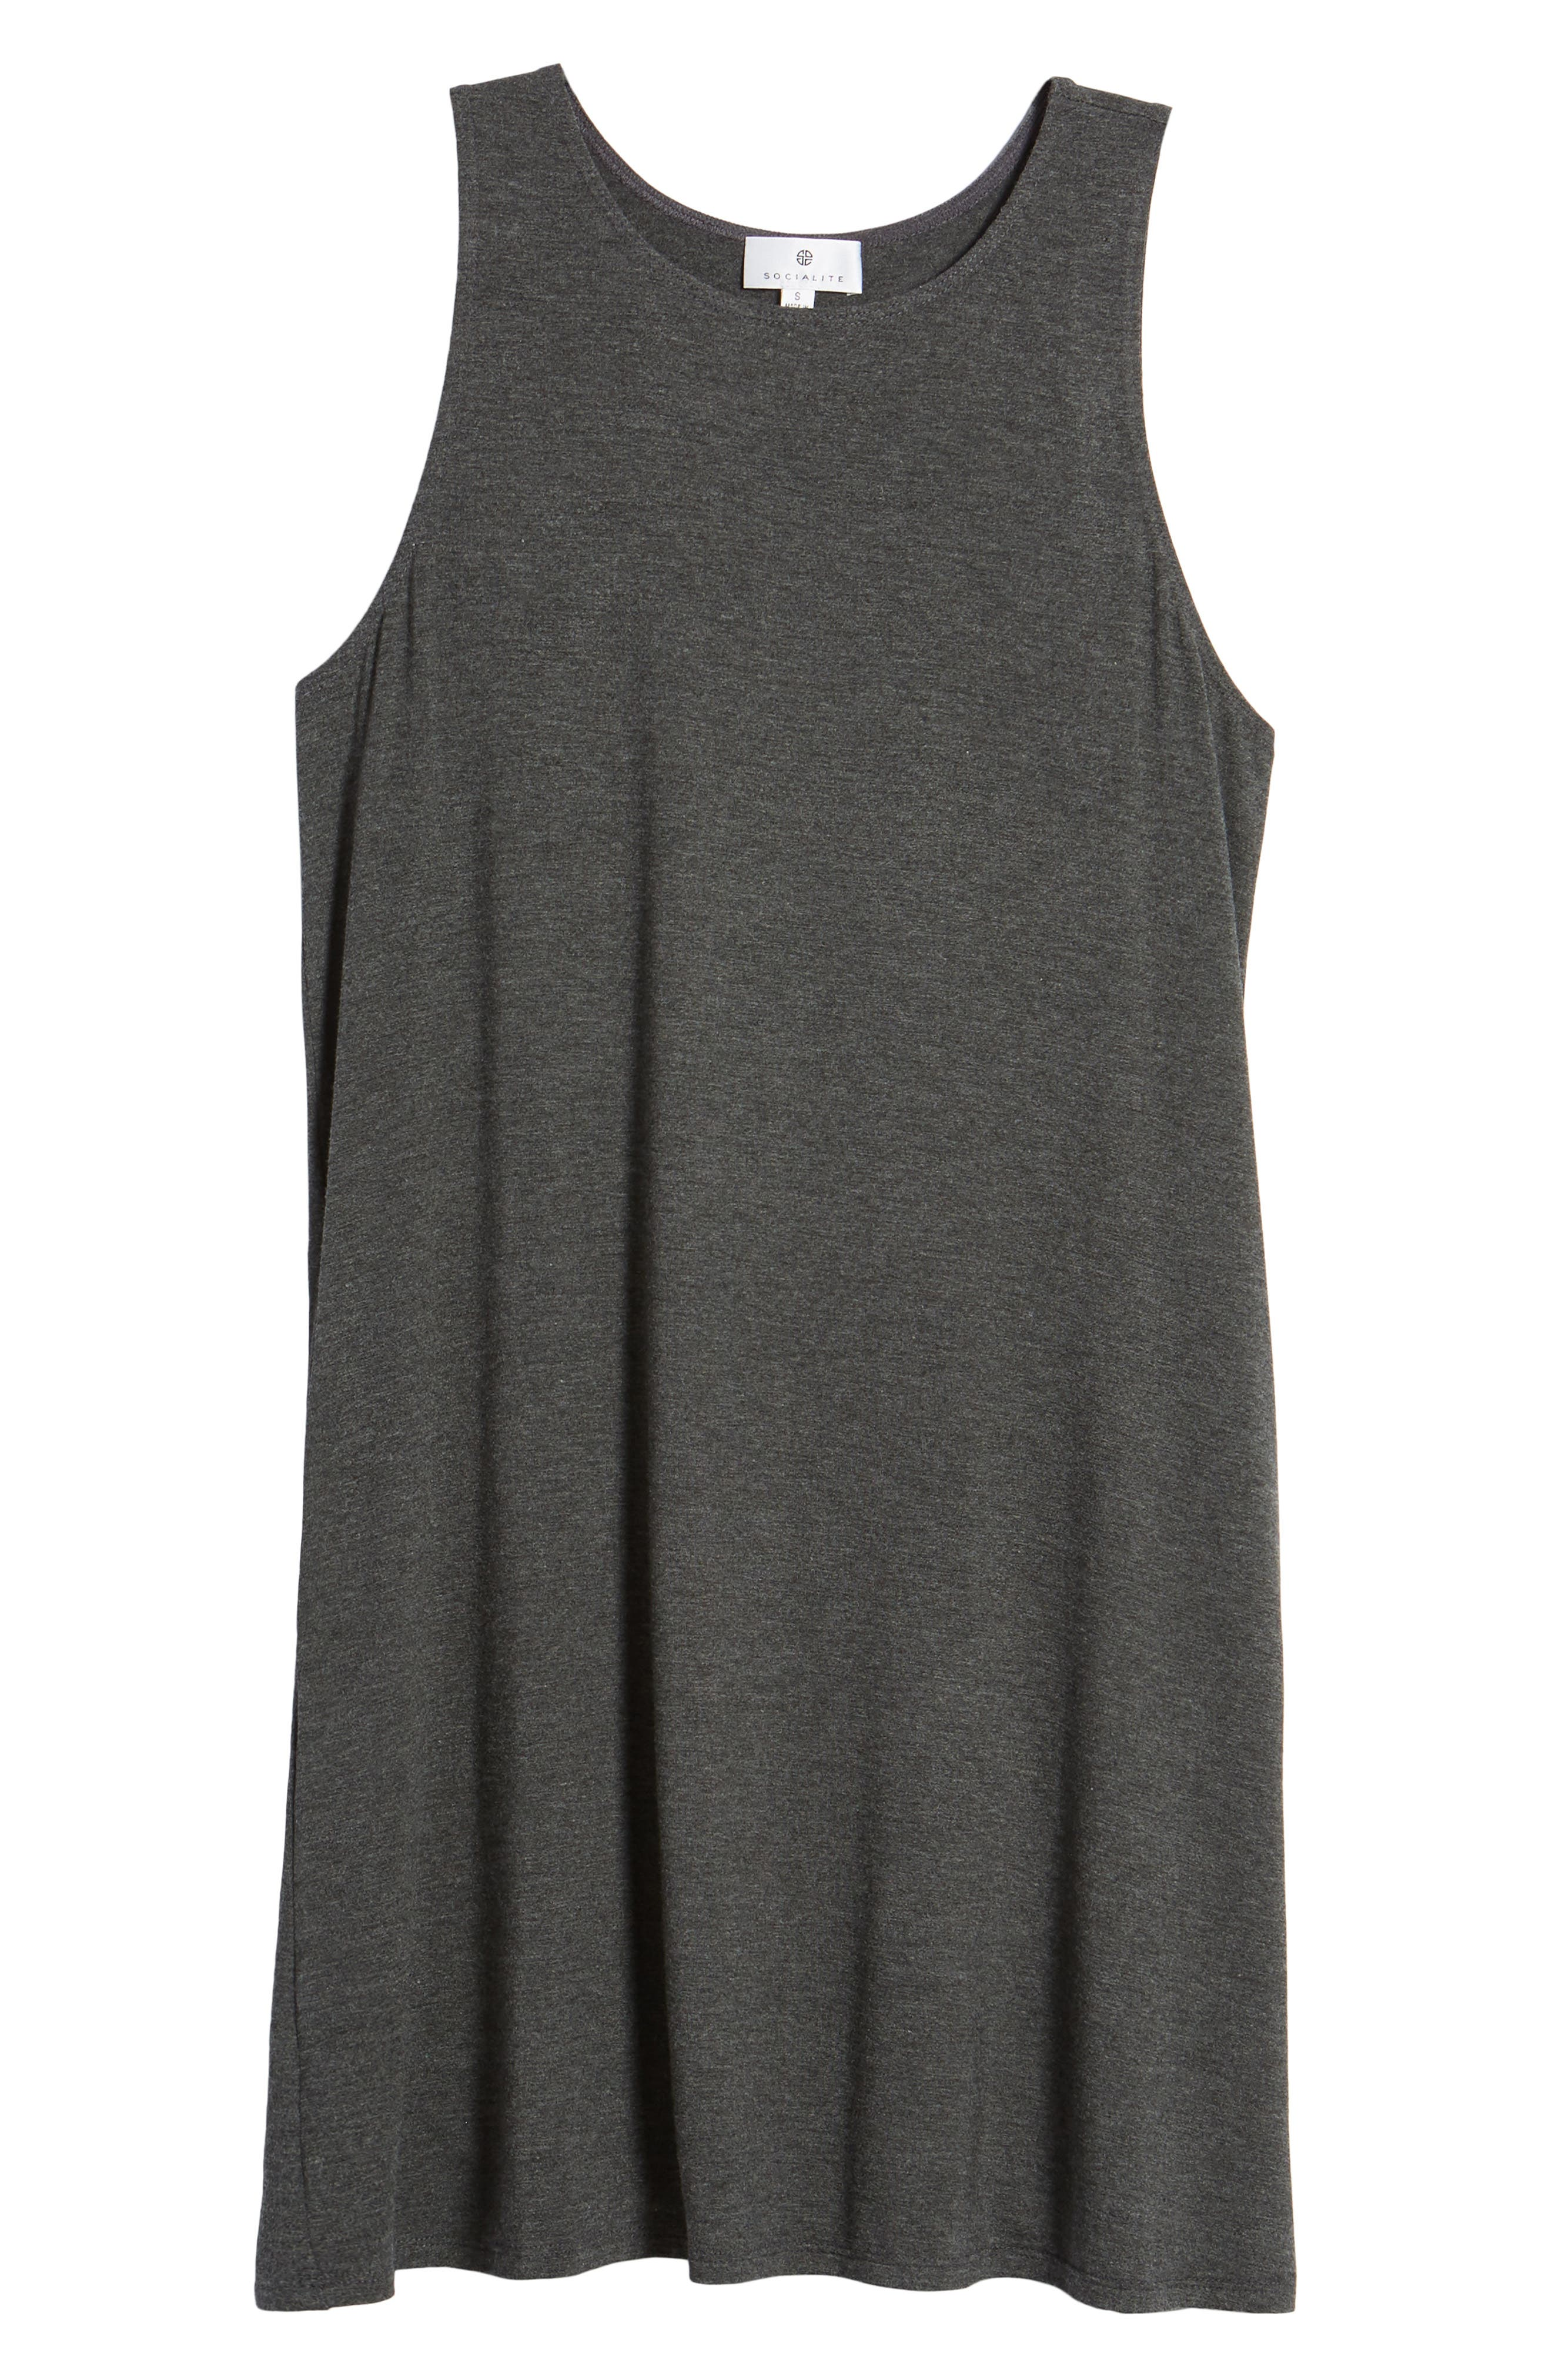 Pocket Tank Dress,                             Alternate thumbnail 7, color,                             Dark Charcoal